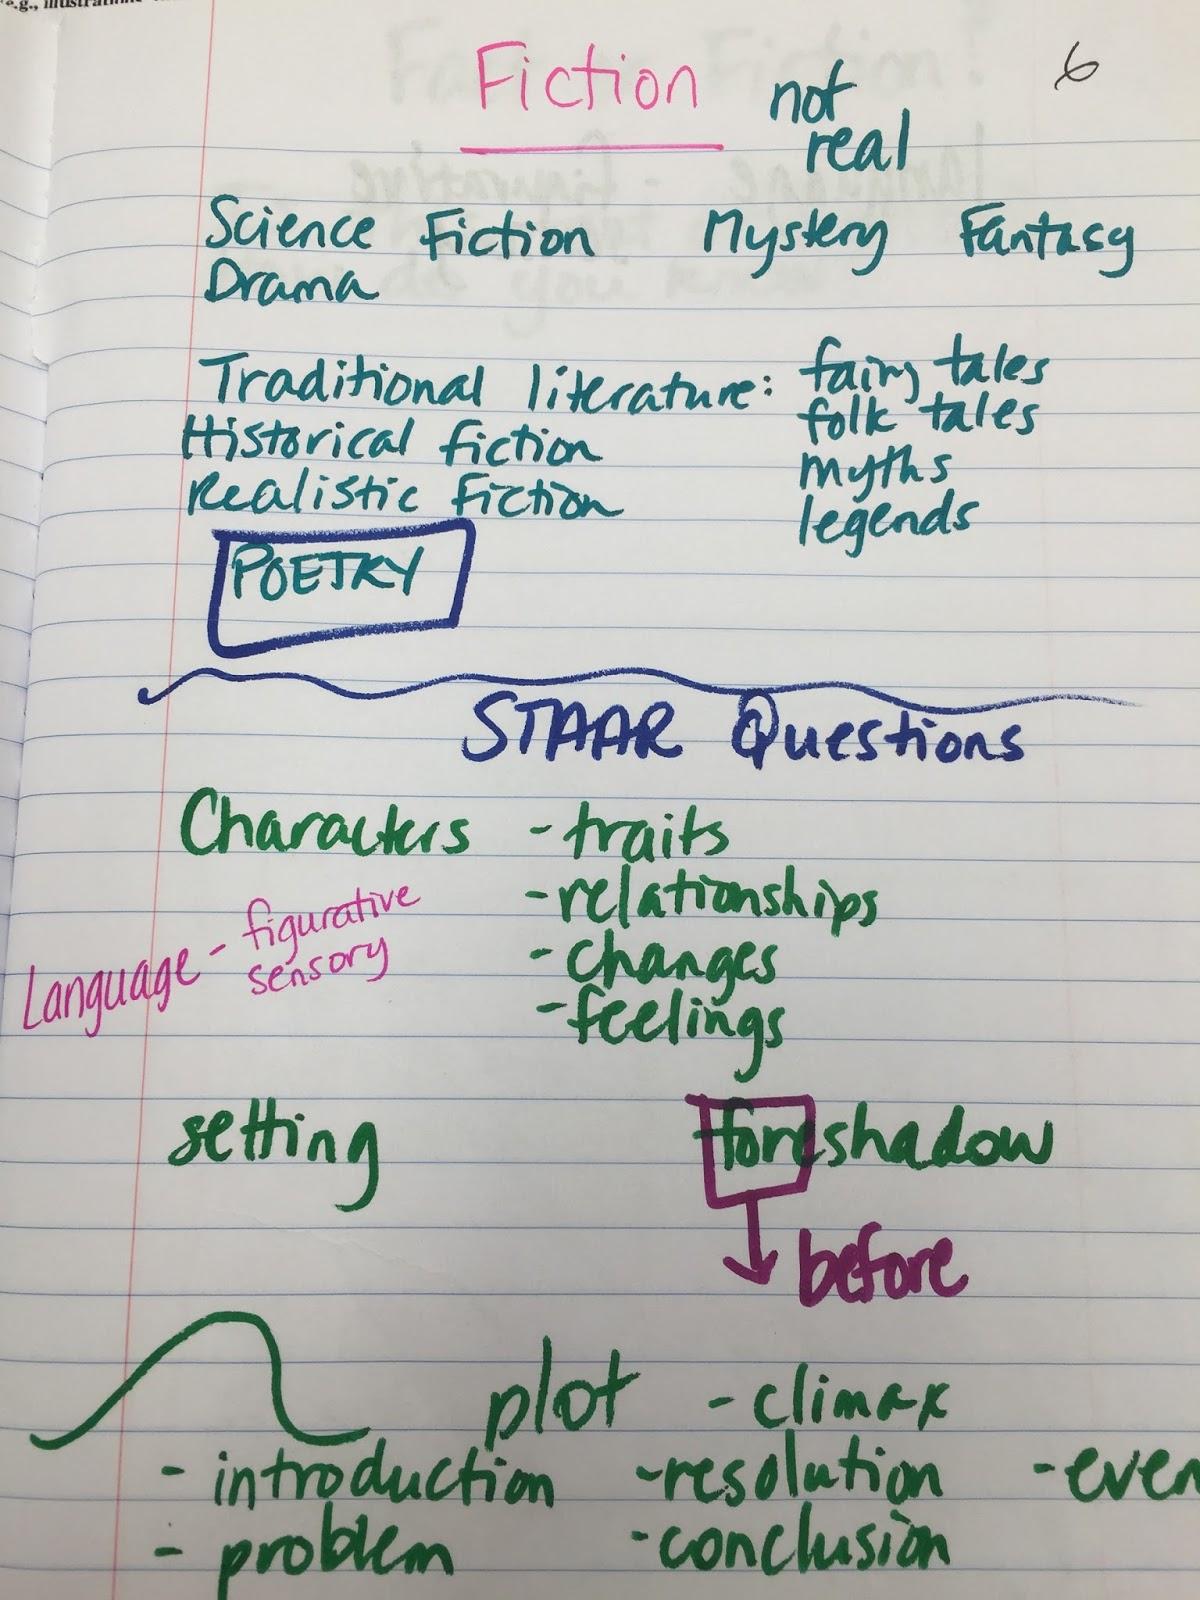 essay writing 4th grade Staar writing and english i, ii, iii resources staar grade 4 writing tepsa presentation (ppt posted 06/19/12) staar grades 3-8 and english i, ii.